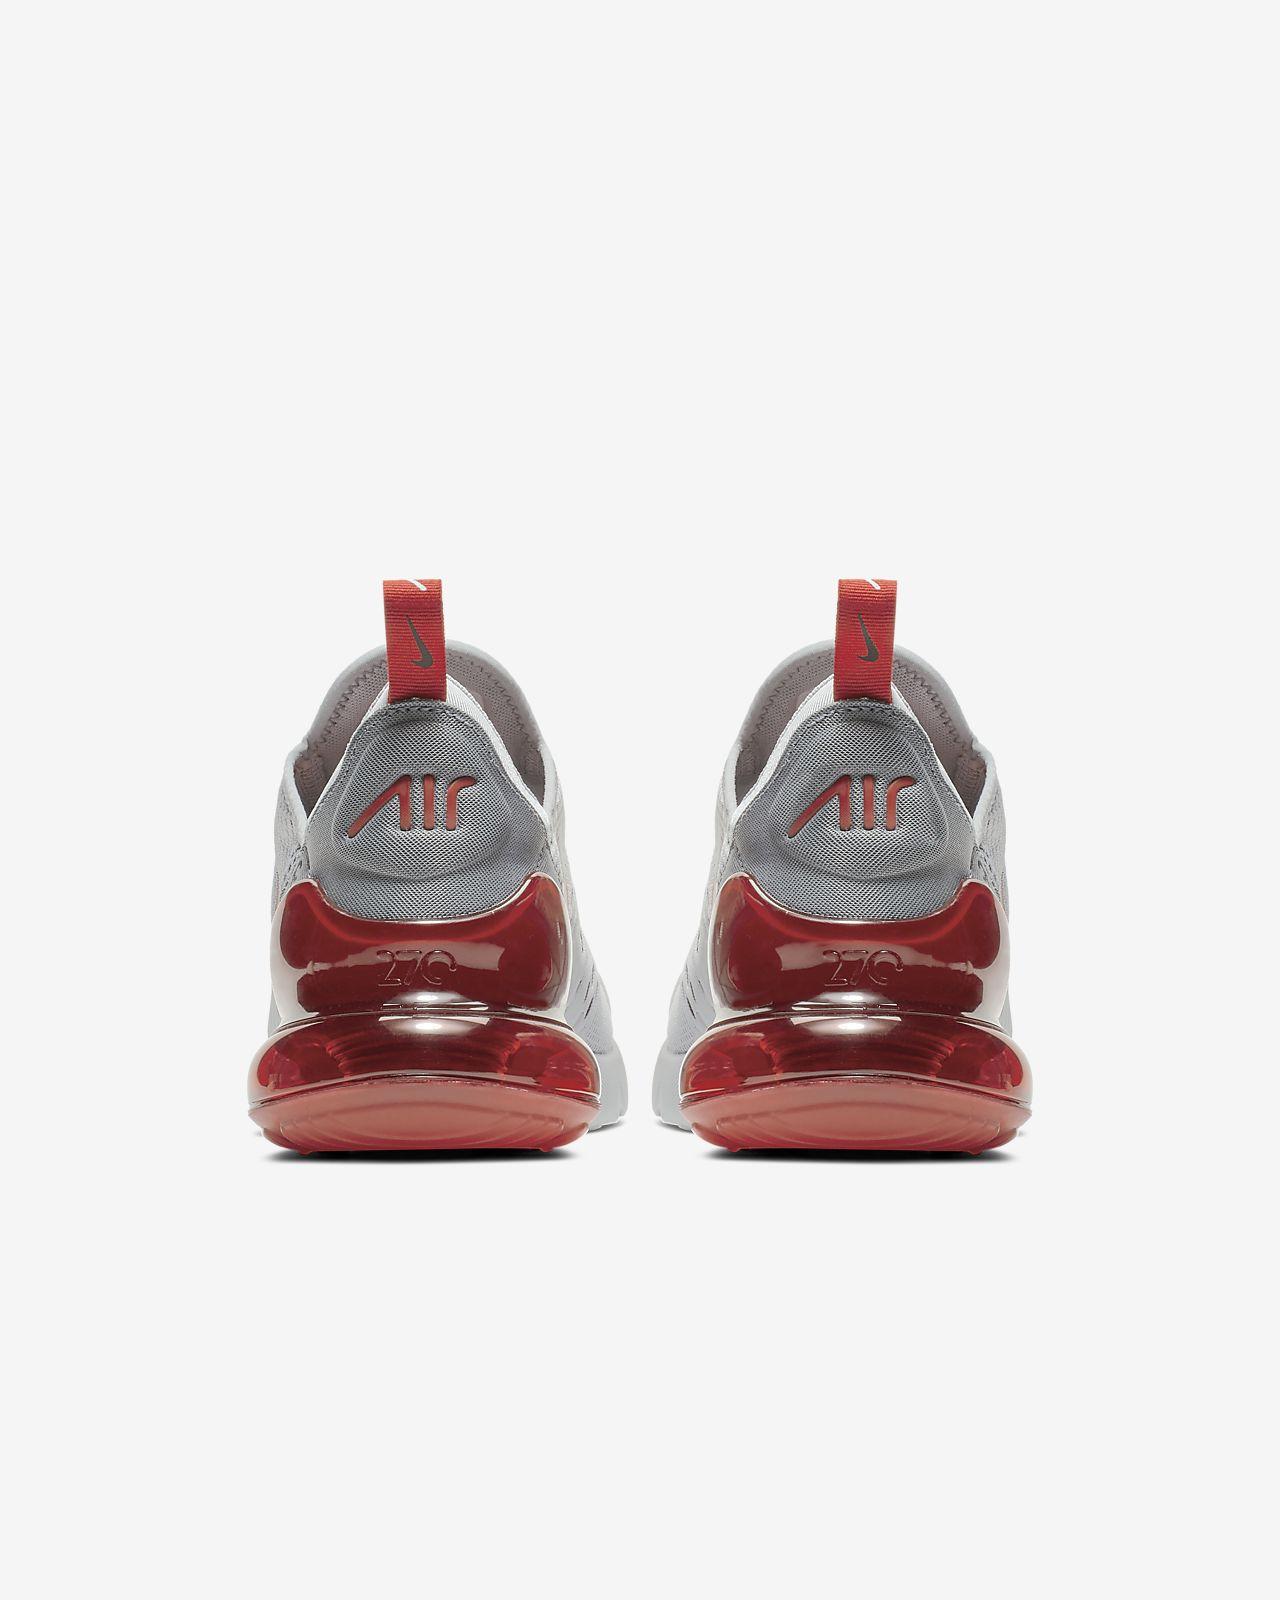 b0fdd3c9bf0 Nike Air Max 270 Herenschoen. Nike.com NL